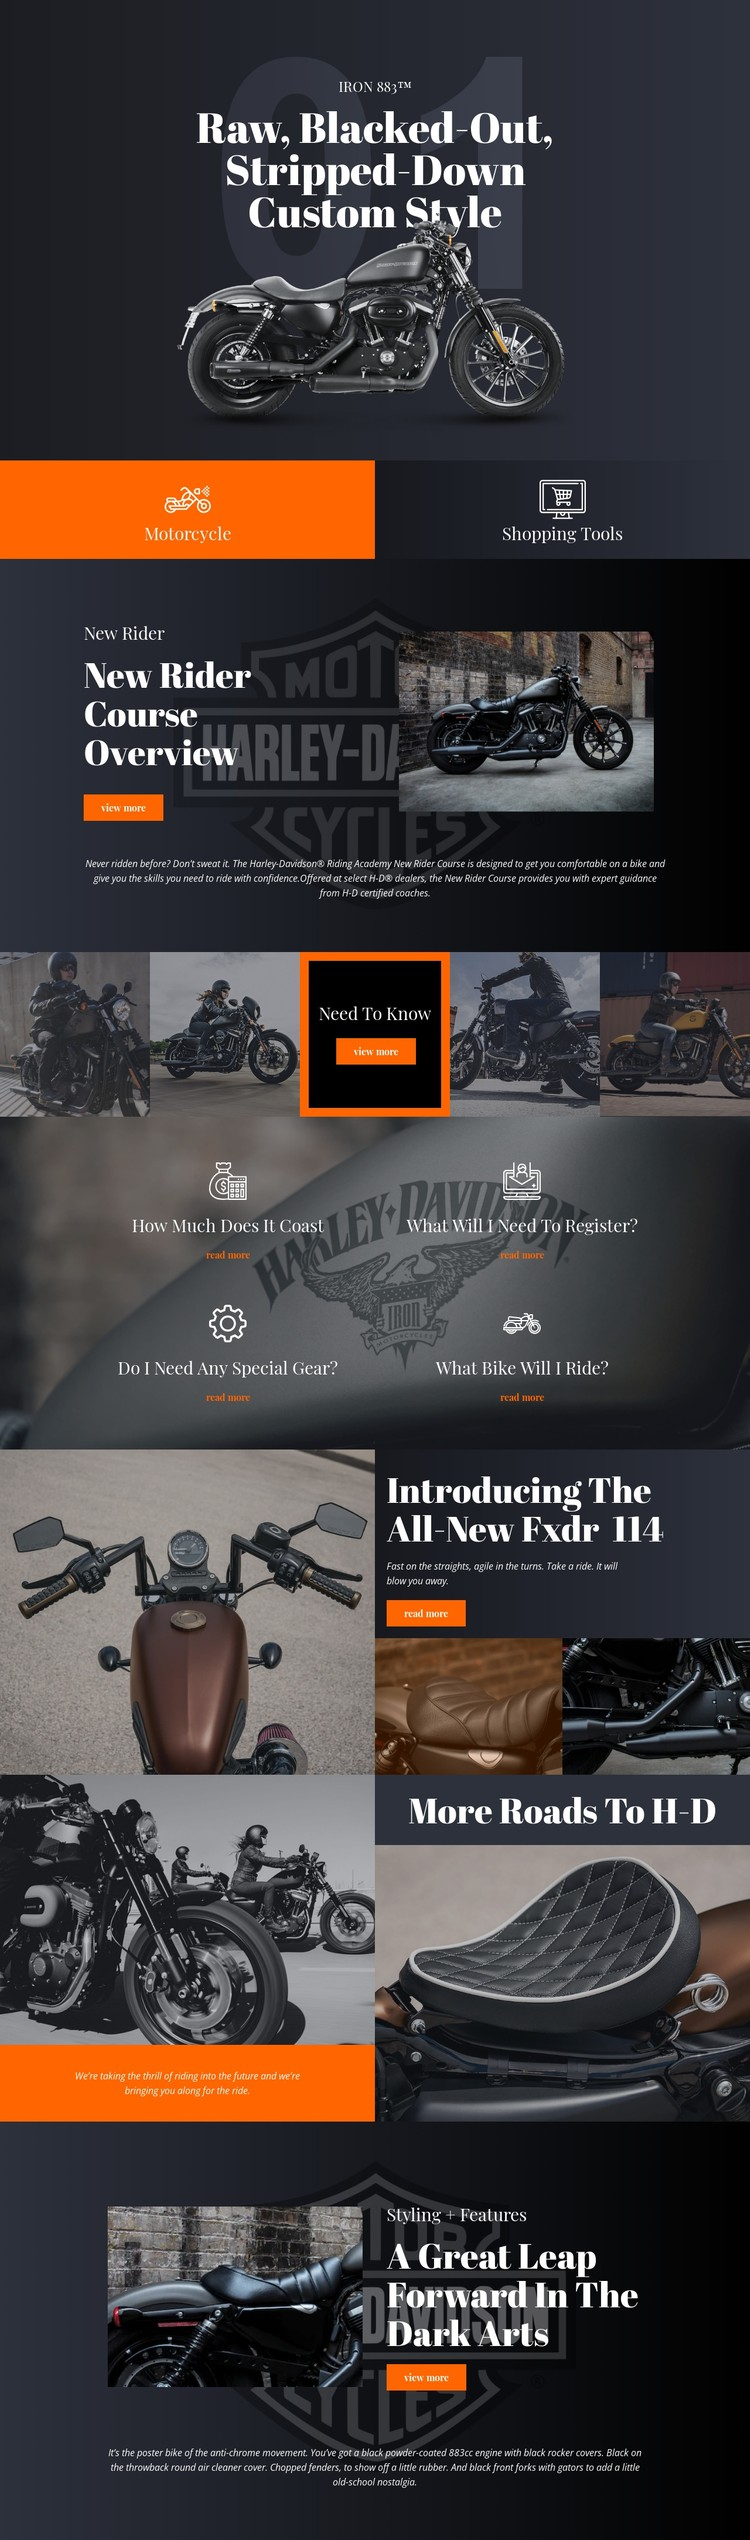 Harley Davidson CSS Template